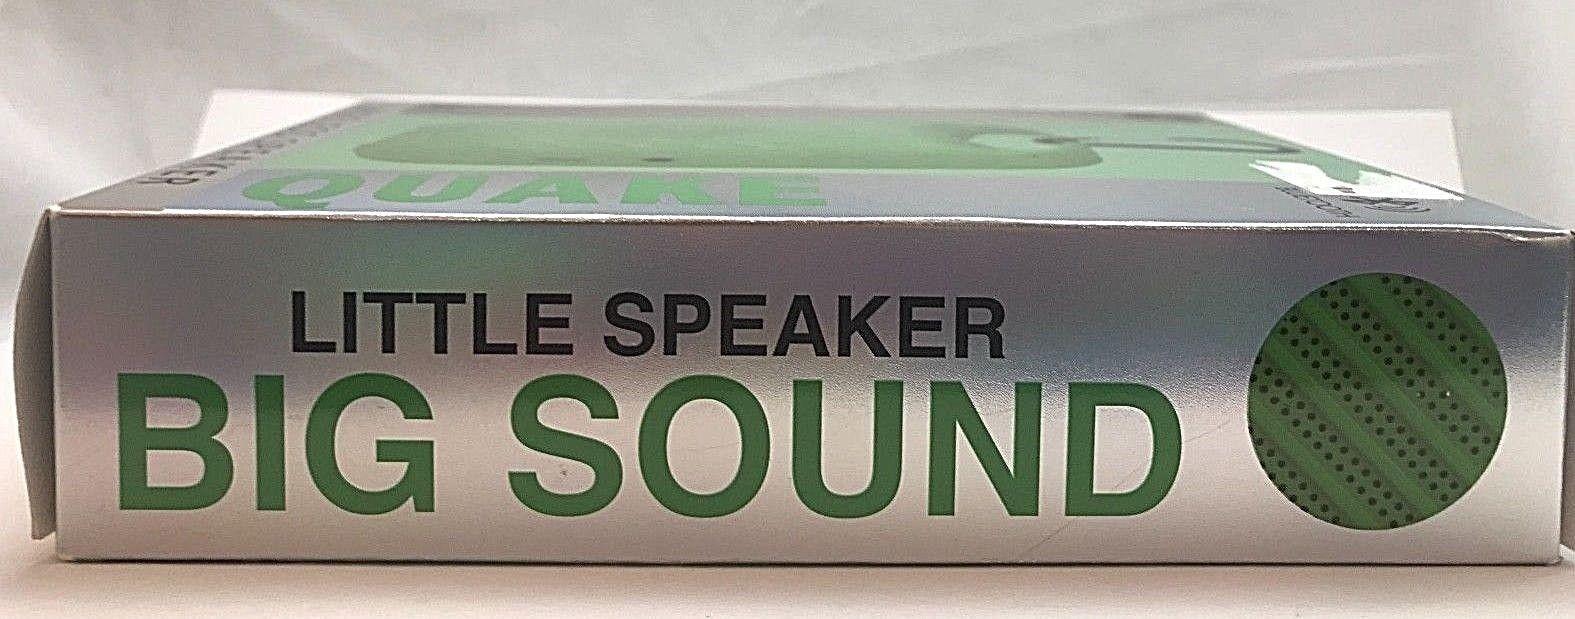 NEW iHip Quake Wireless Speaker - Green